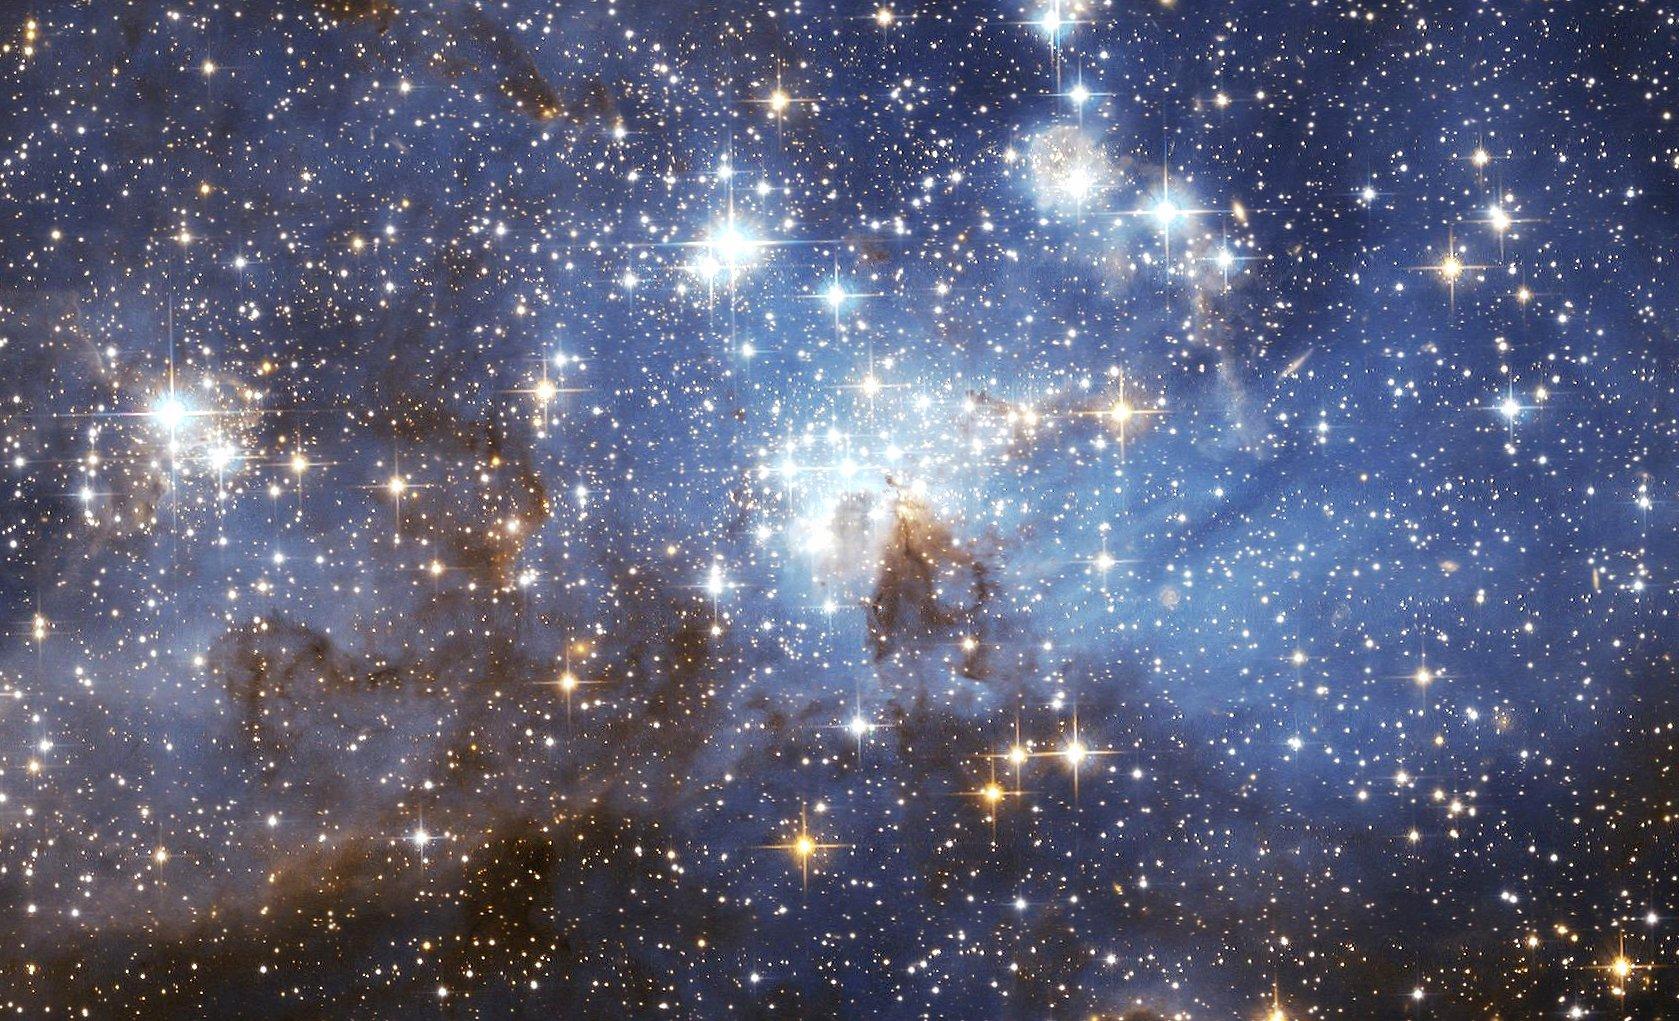 Stars and nebula wallpapers HD quality